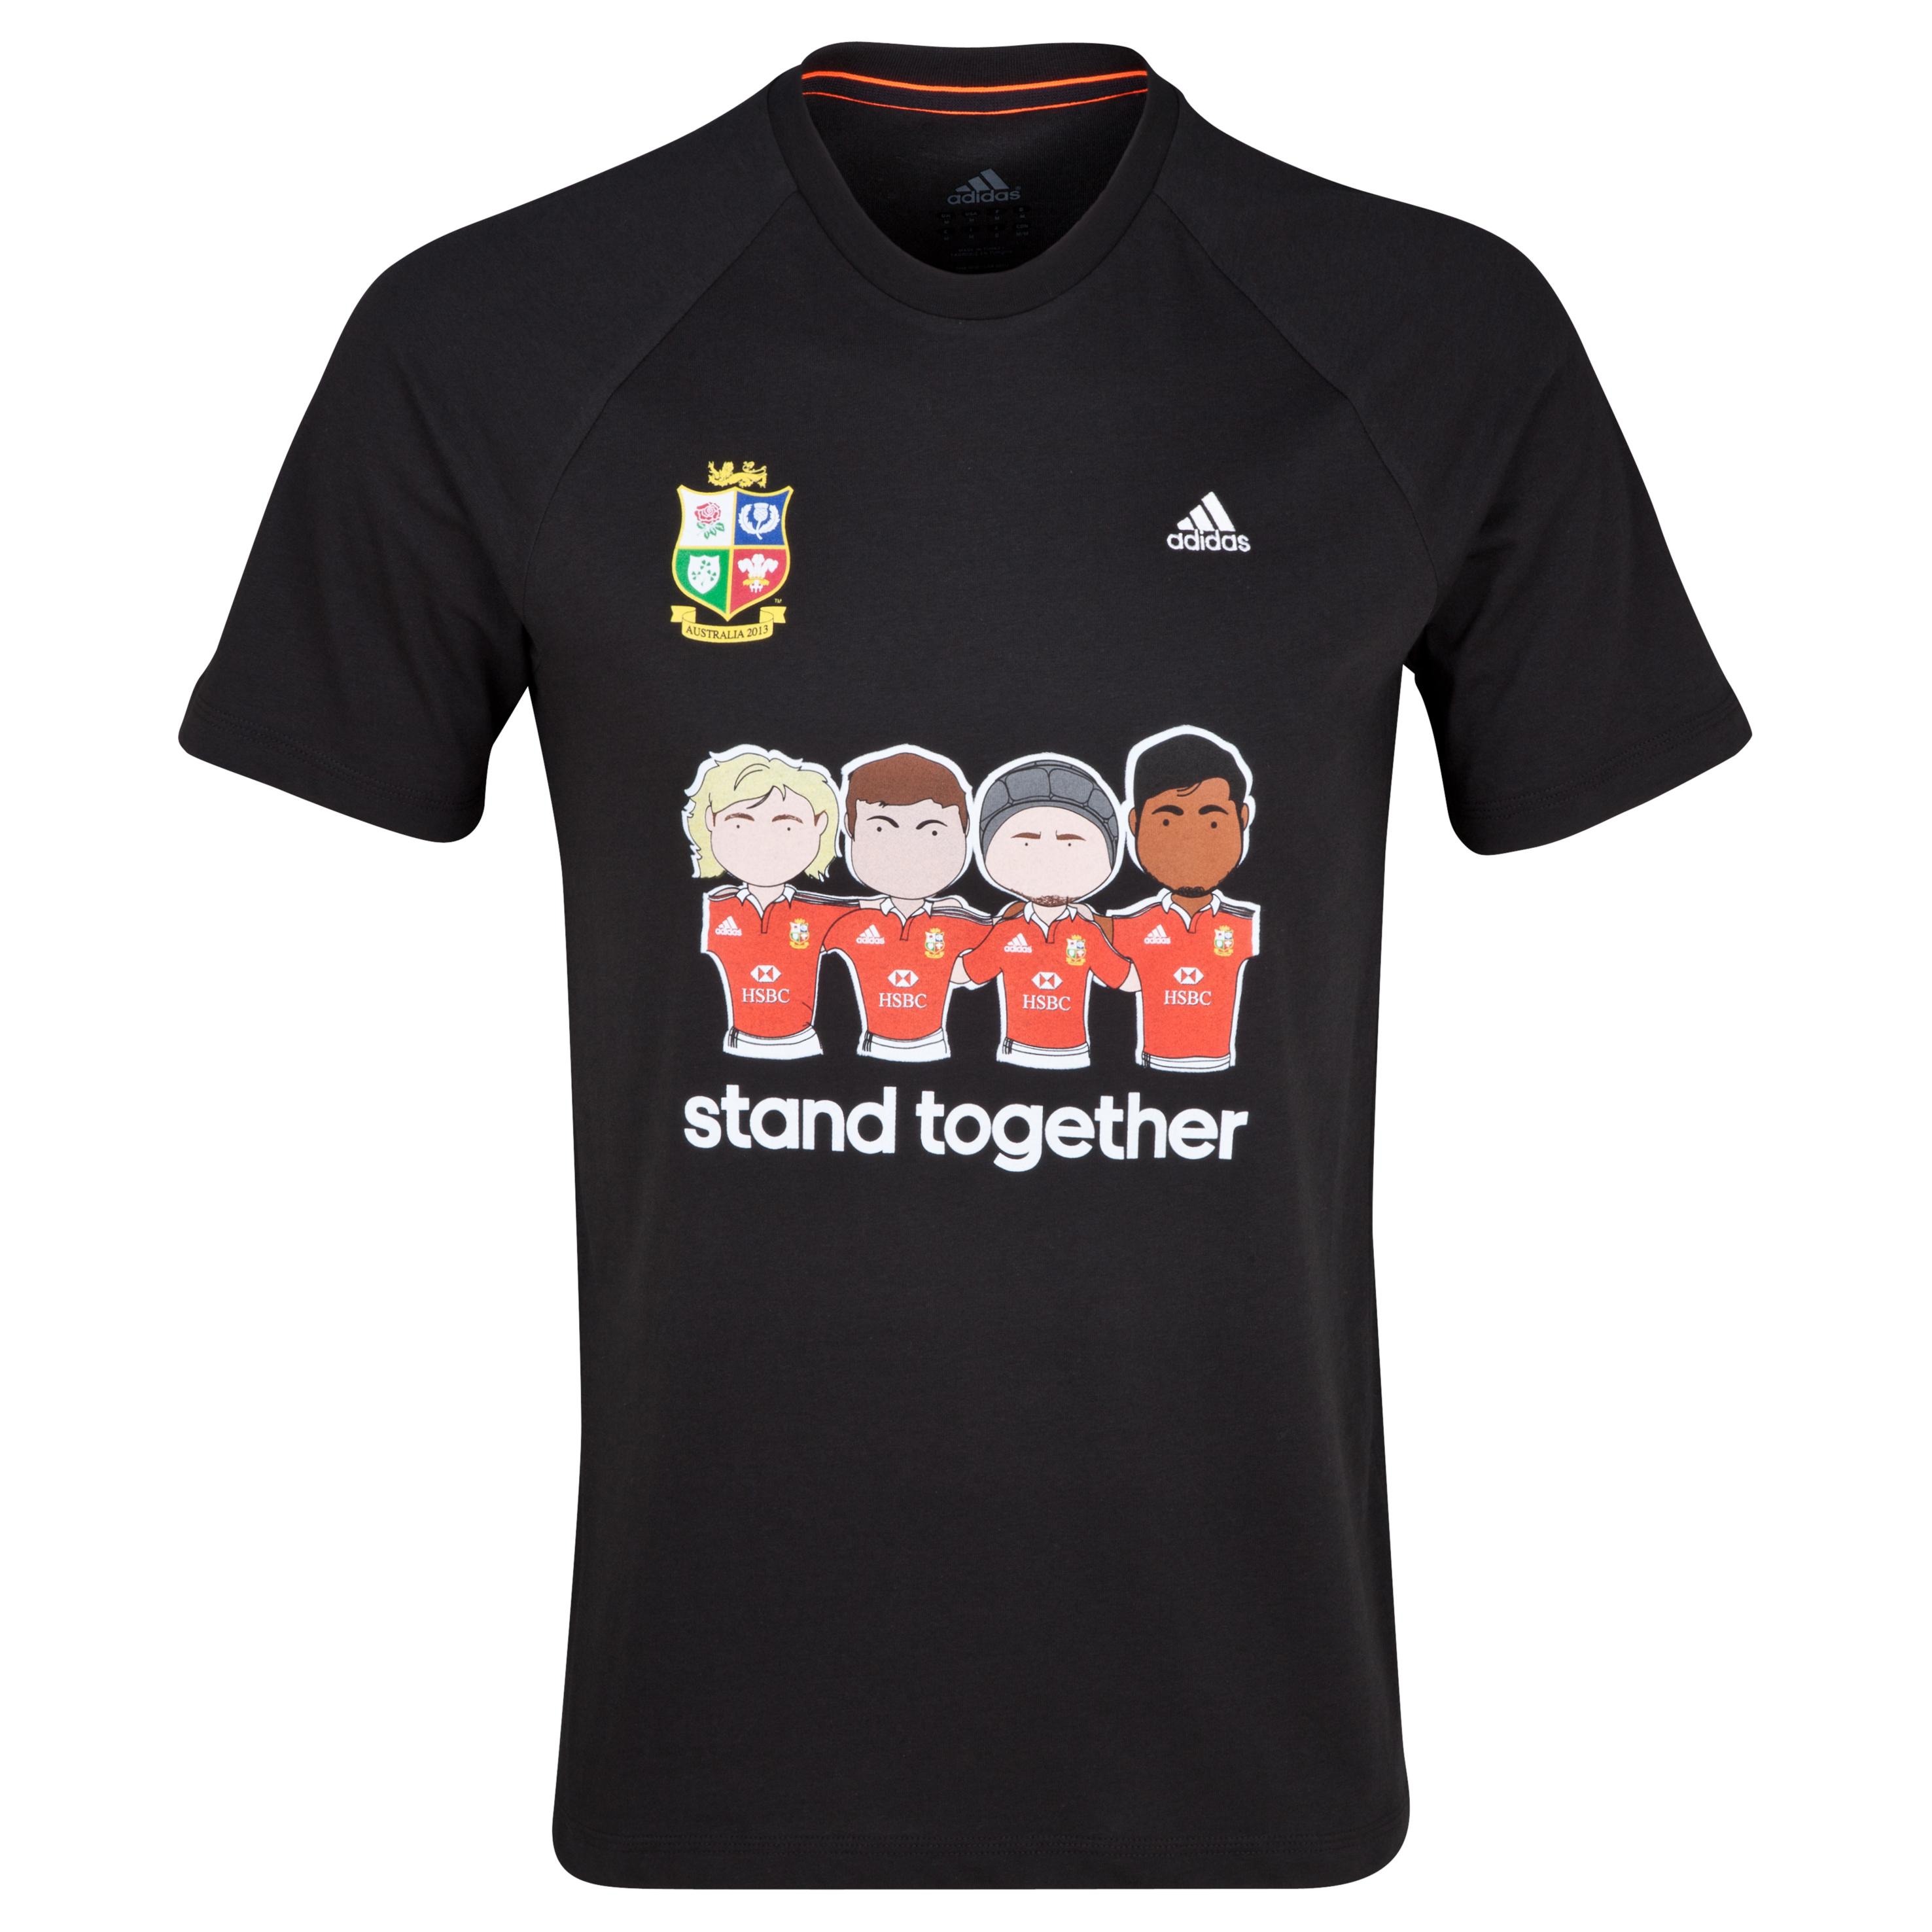 British & Irish Lions adidas Campaign T-Shirt Black